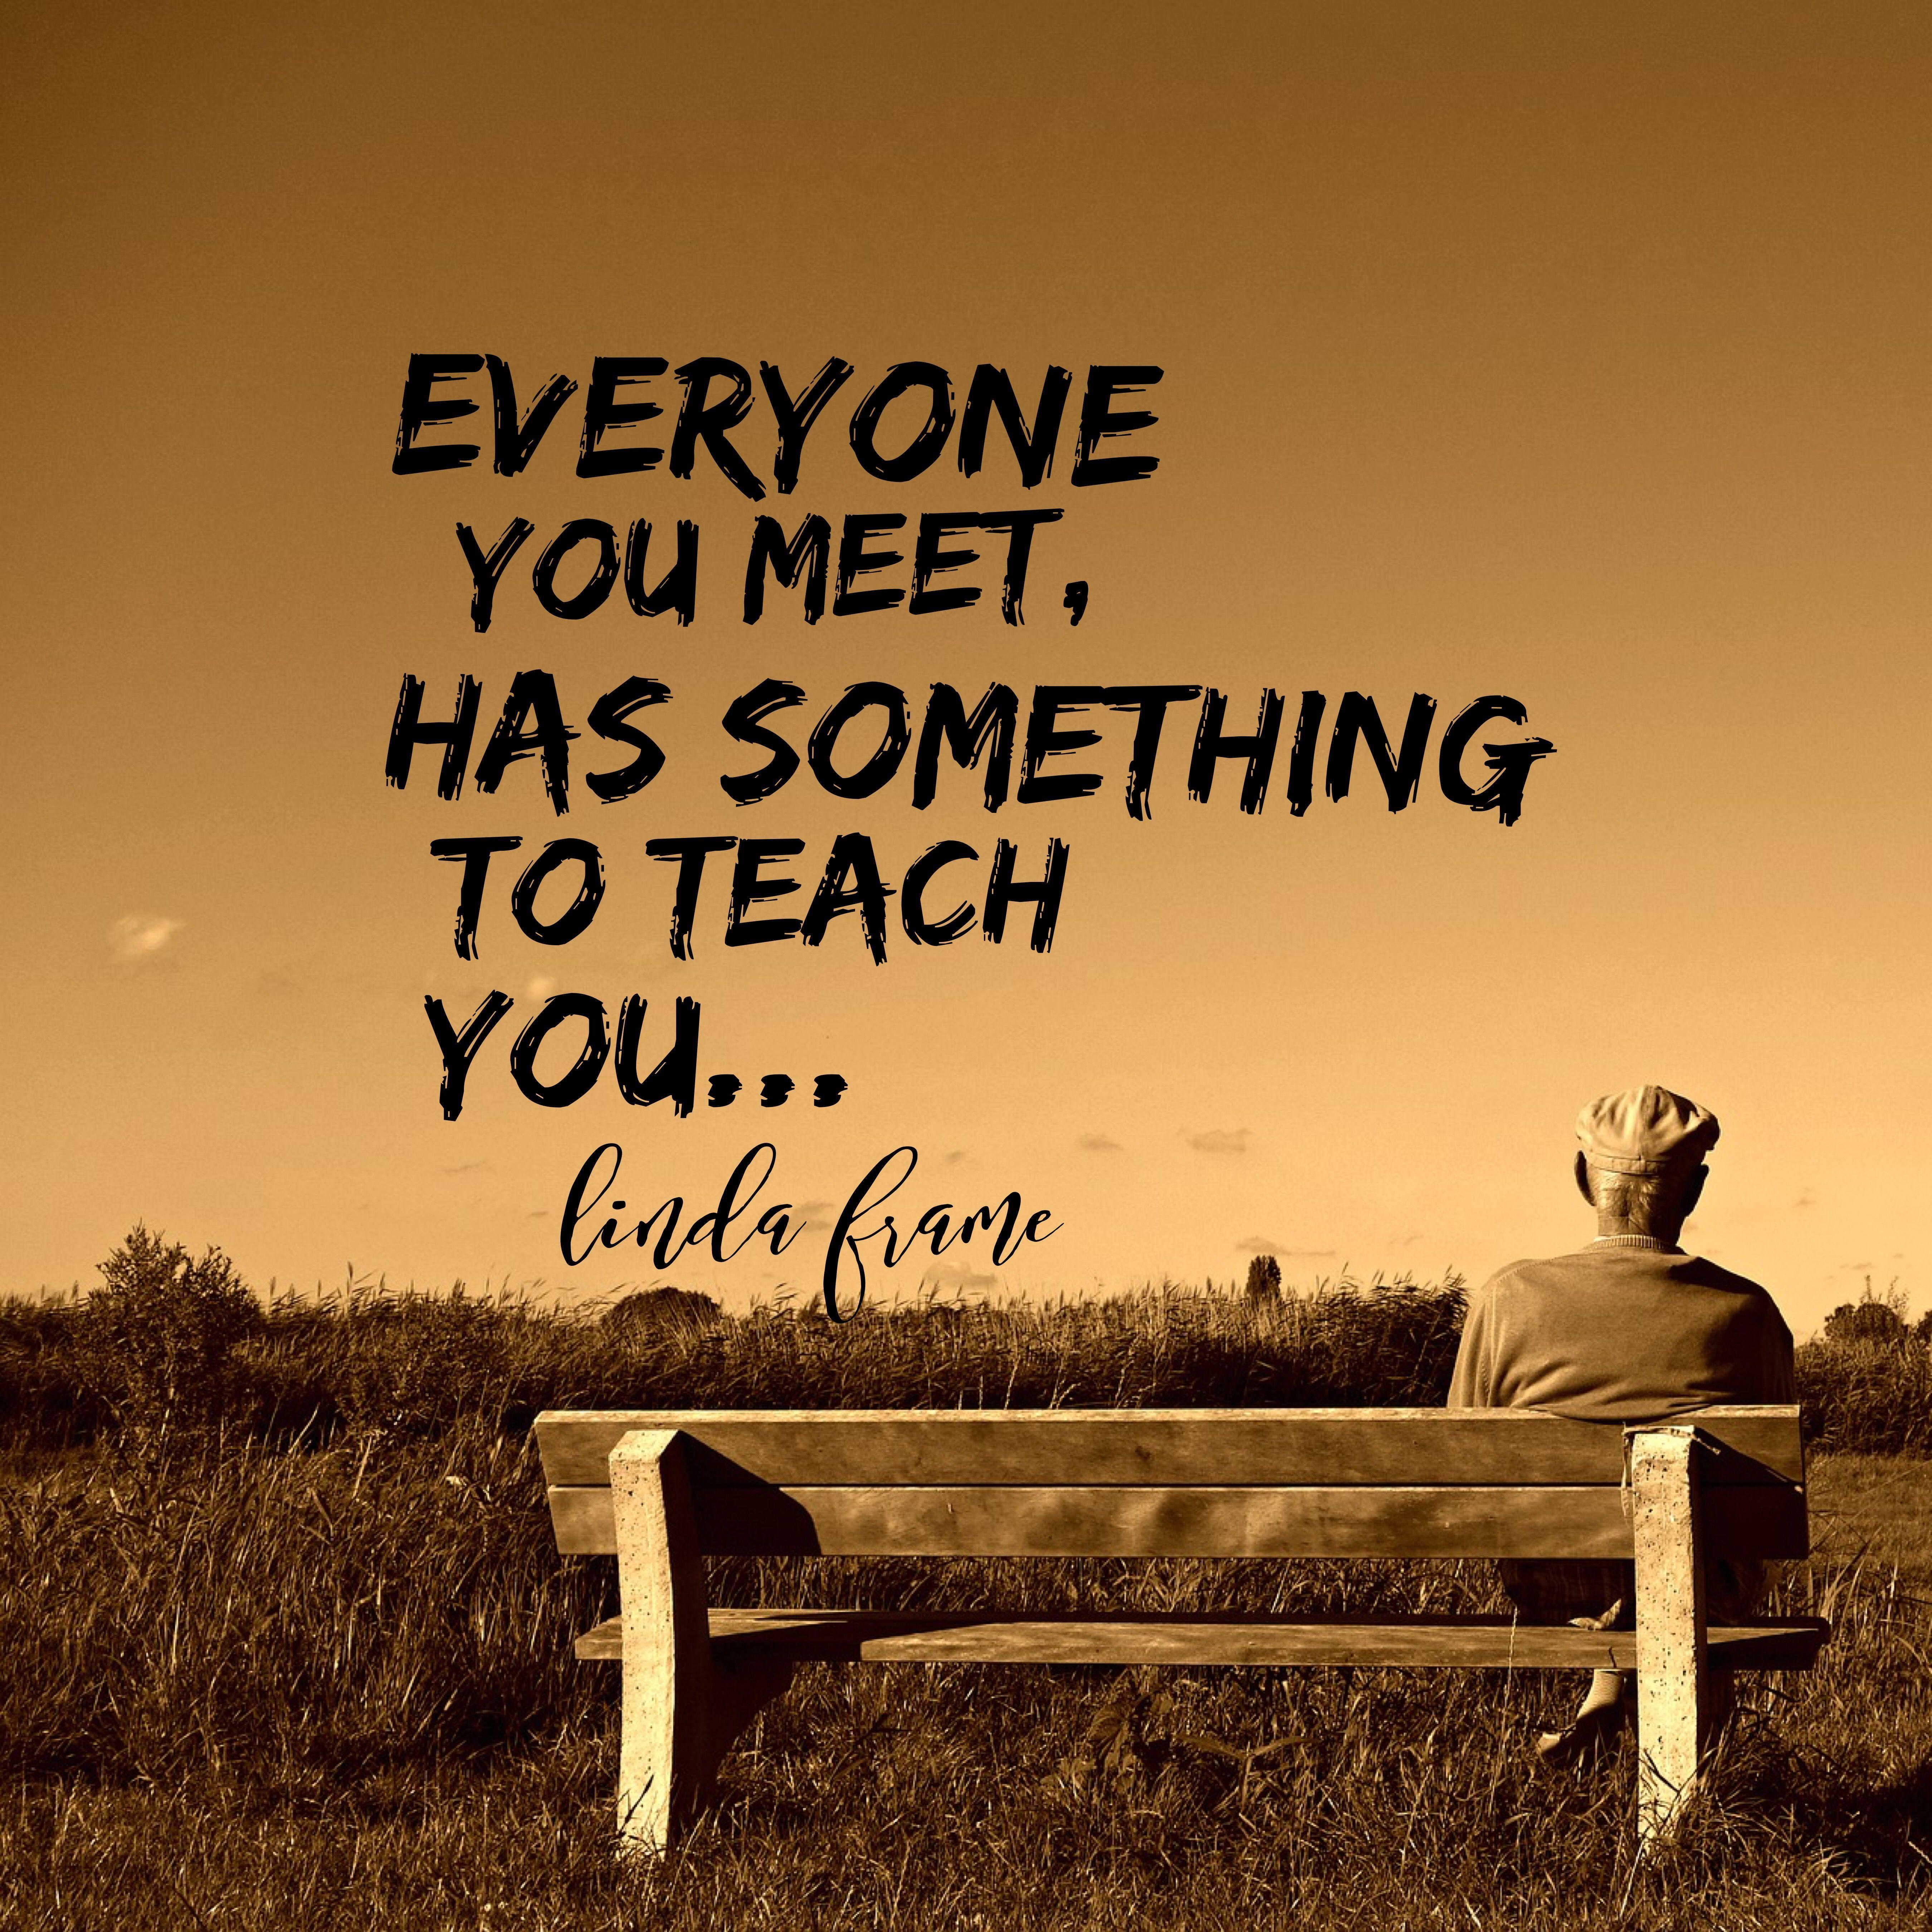 Everyone You Meet Has Something To Teach You